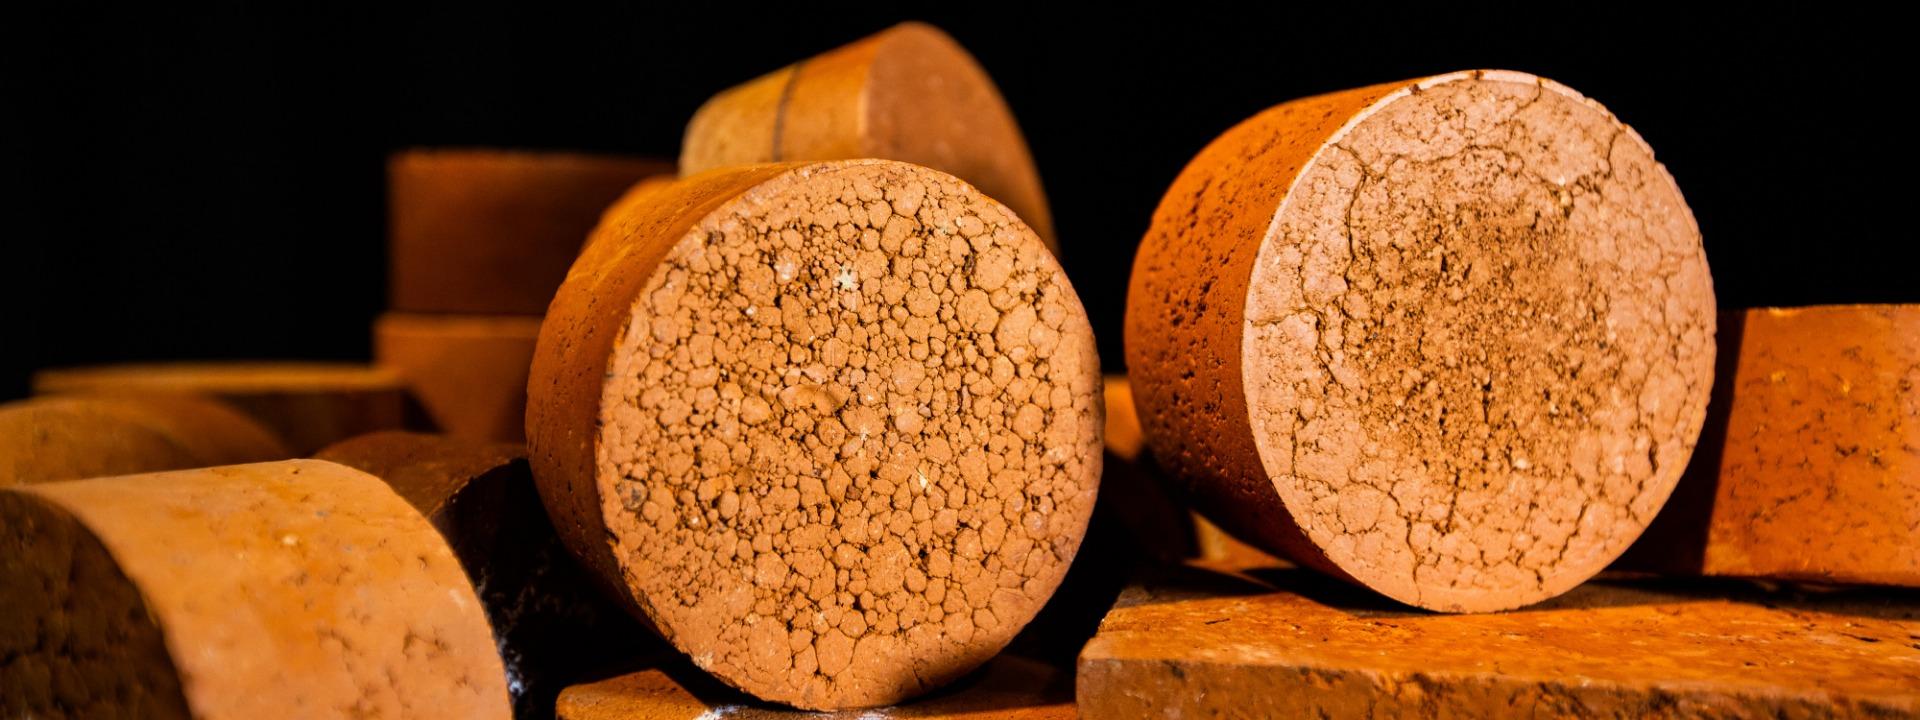 Environmentally-friendly bricks made from sewage-treatment byproduct